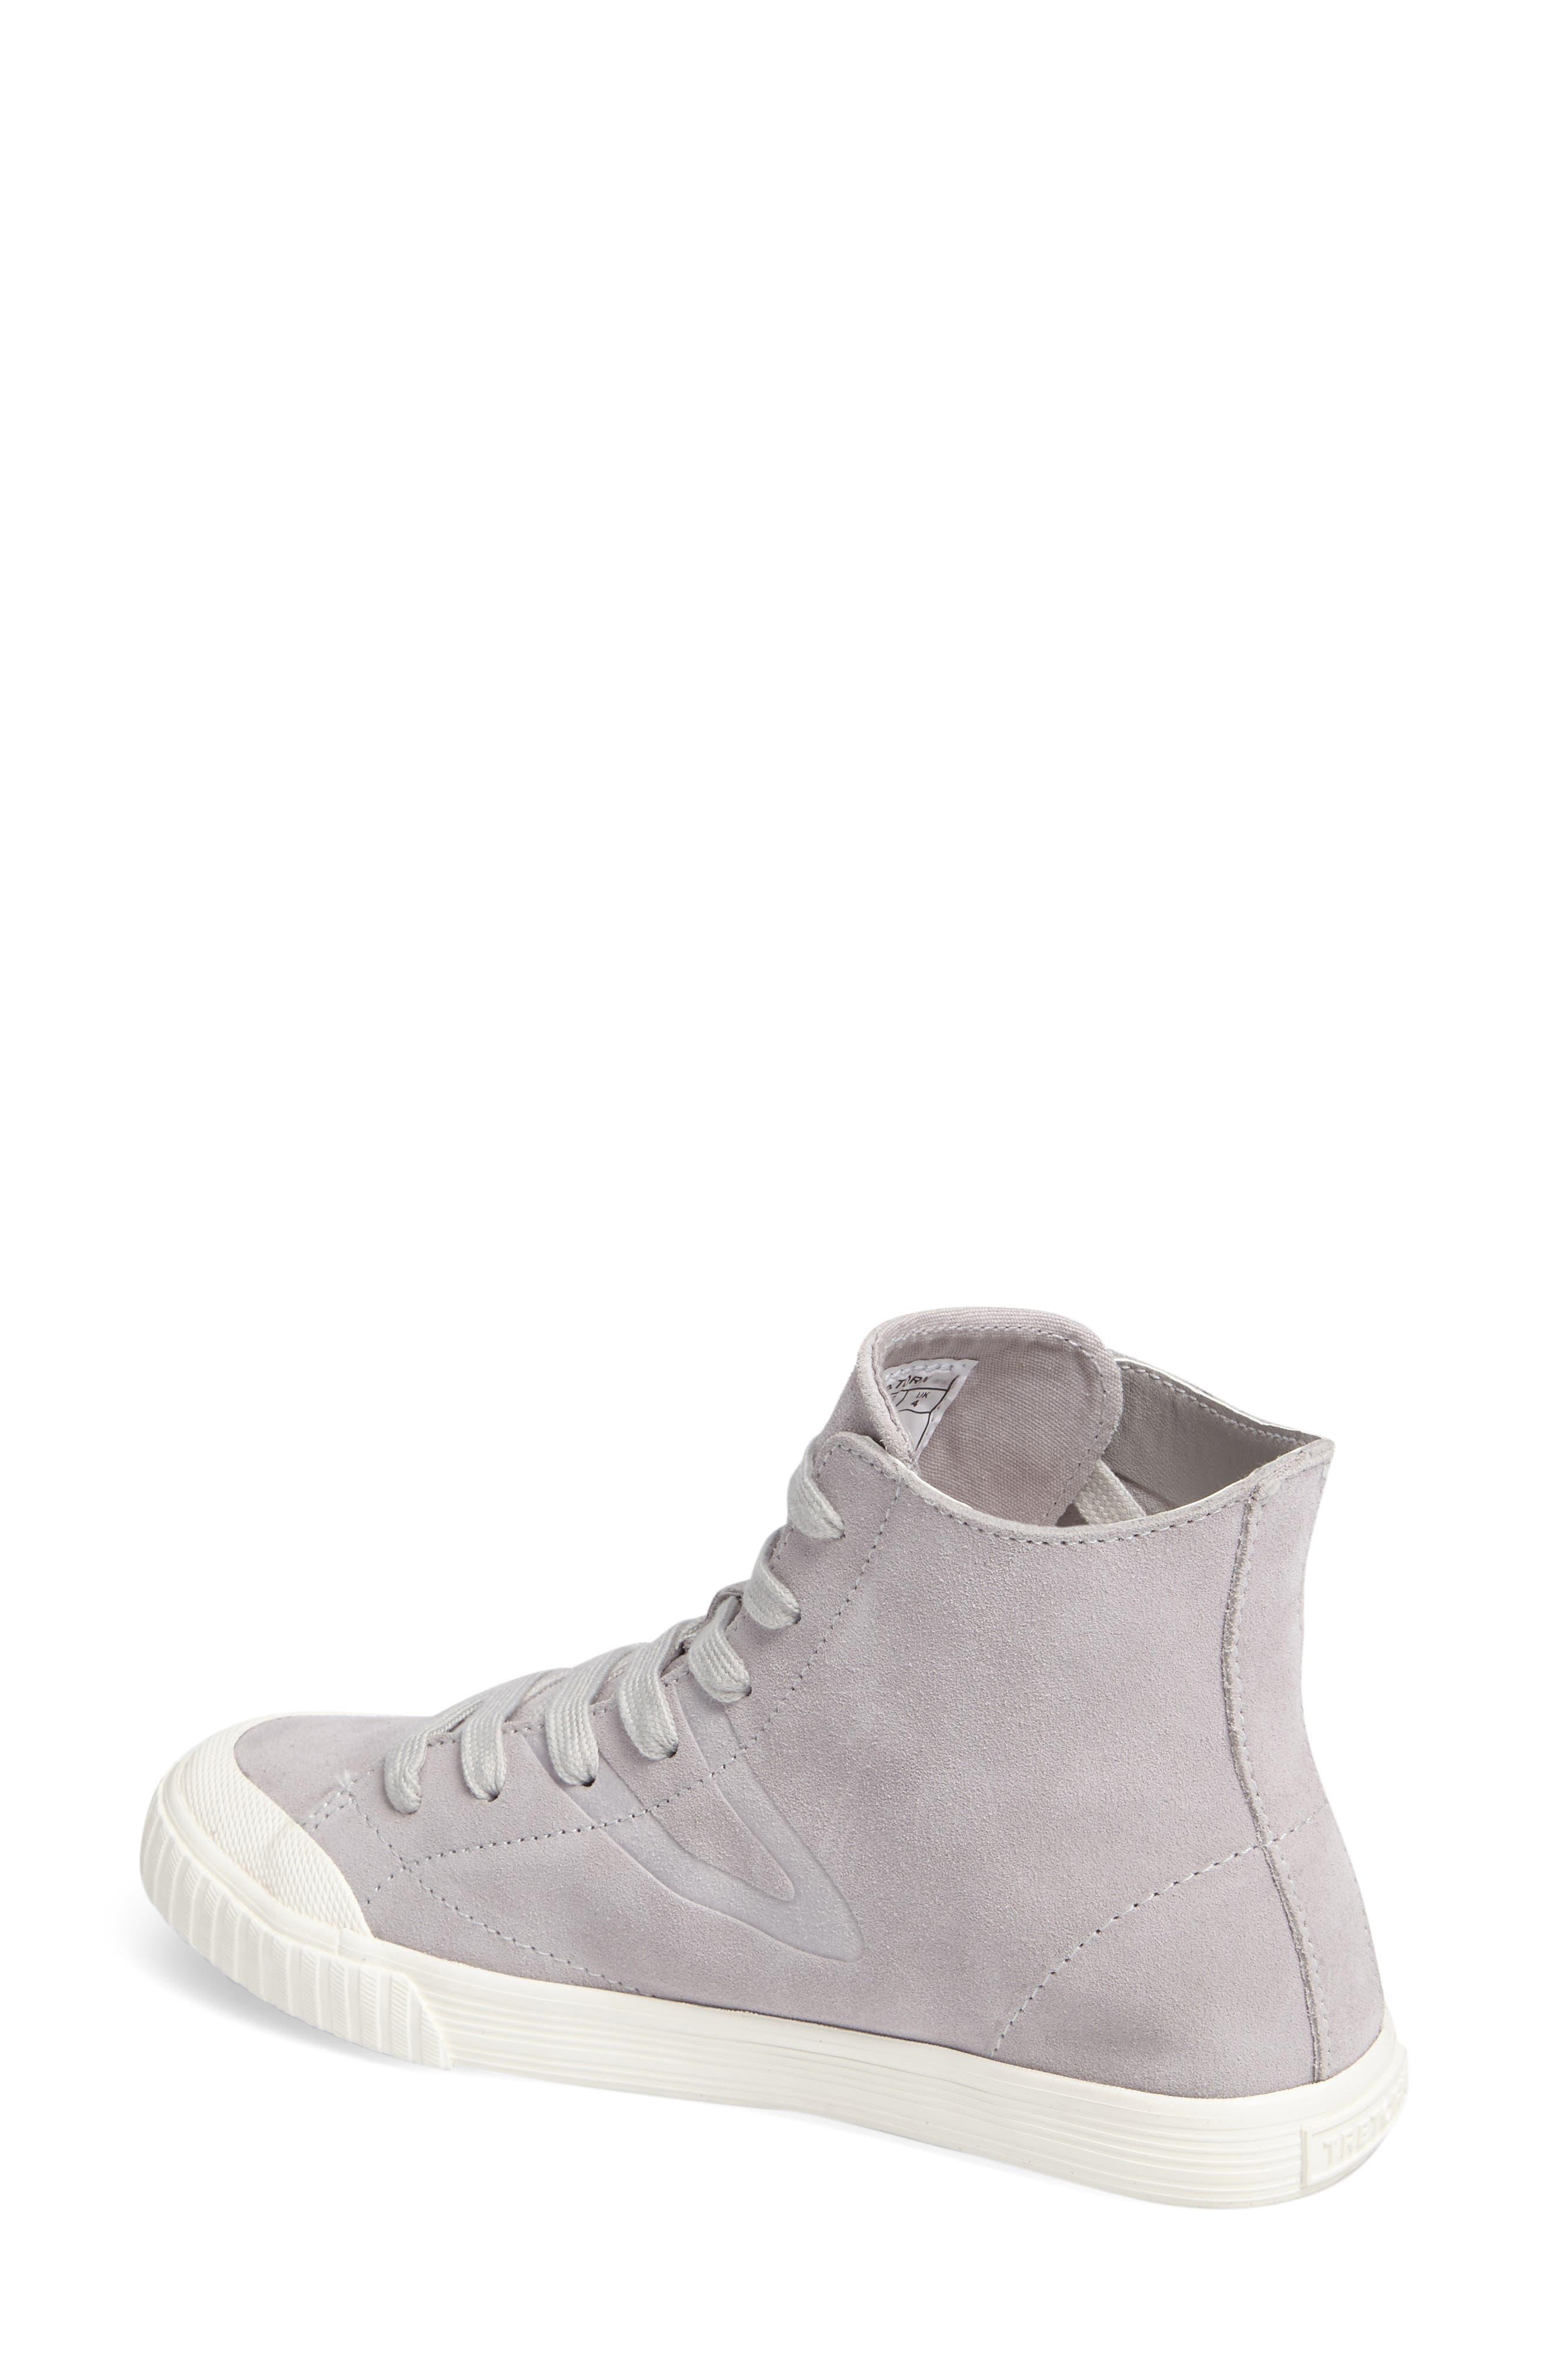 Marley 2 High Top Sneaker,                             Alternate thumbnail 10, color,